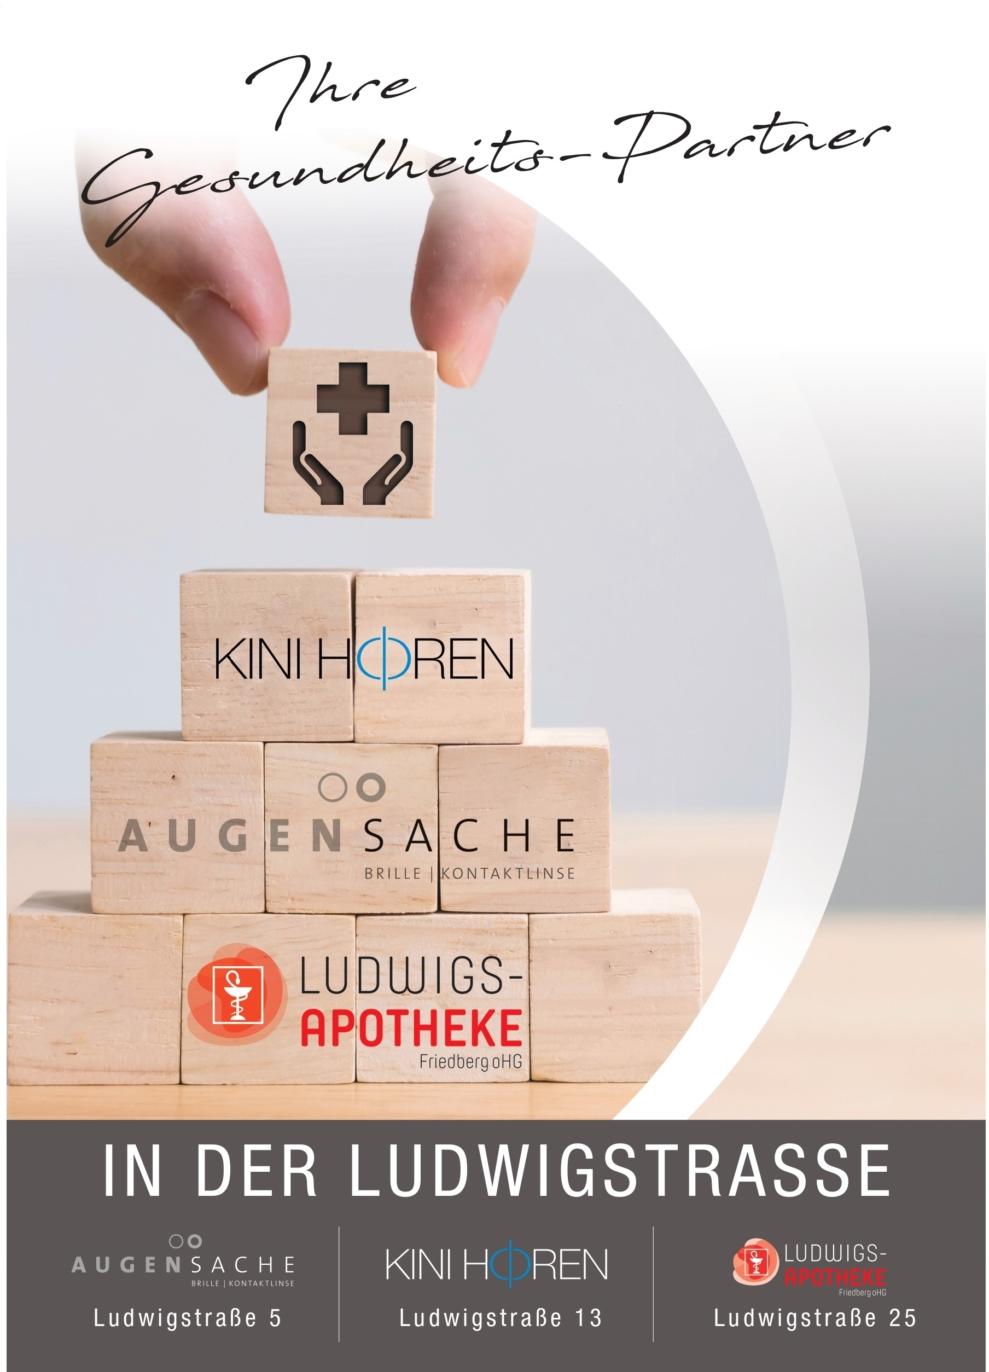 2_Ludwigsapotheke_Kini hören_Gesundheitstage by Optiker Augensache Brille Kontaktlinse